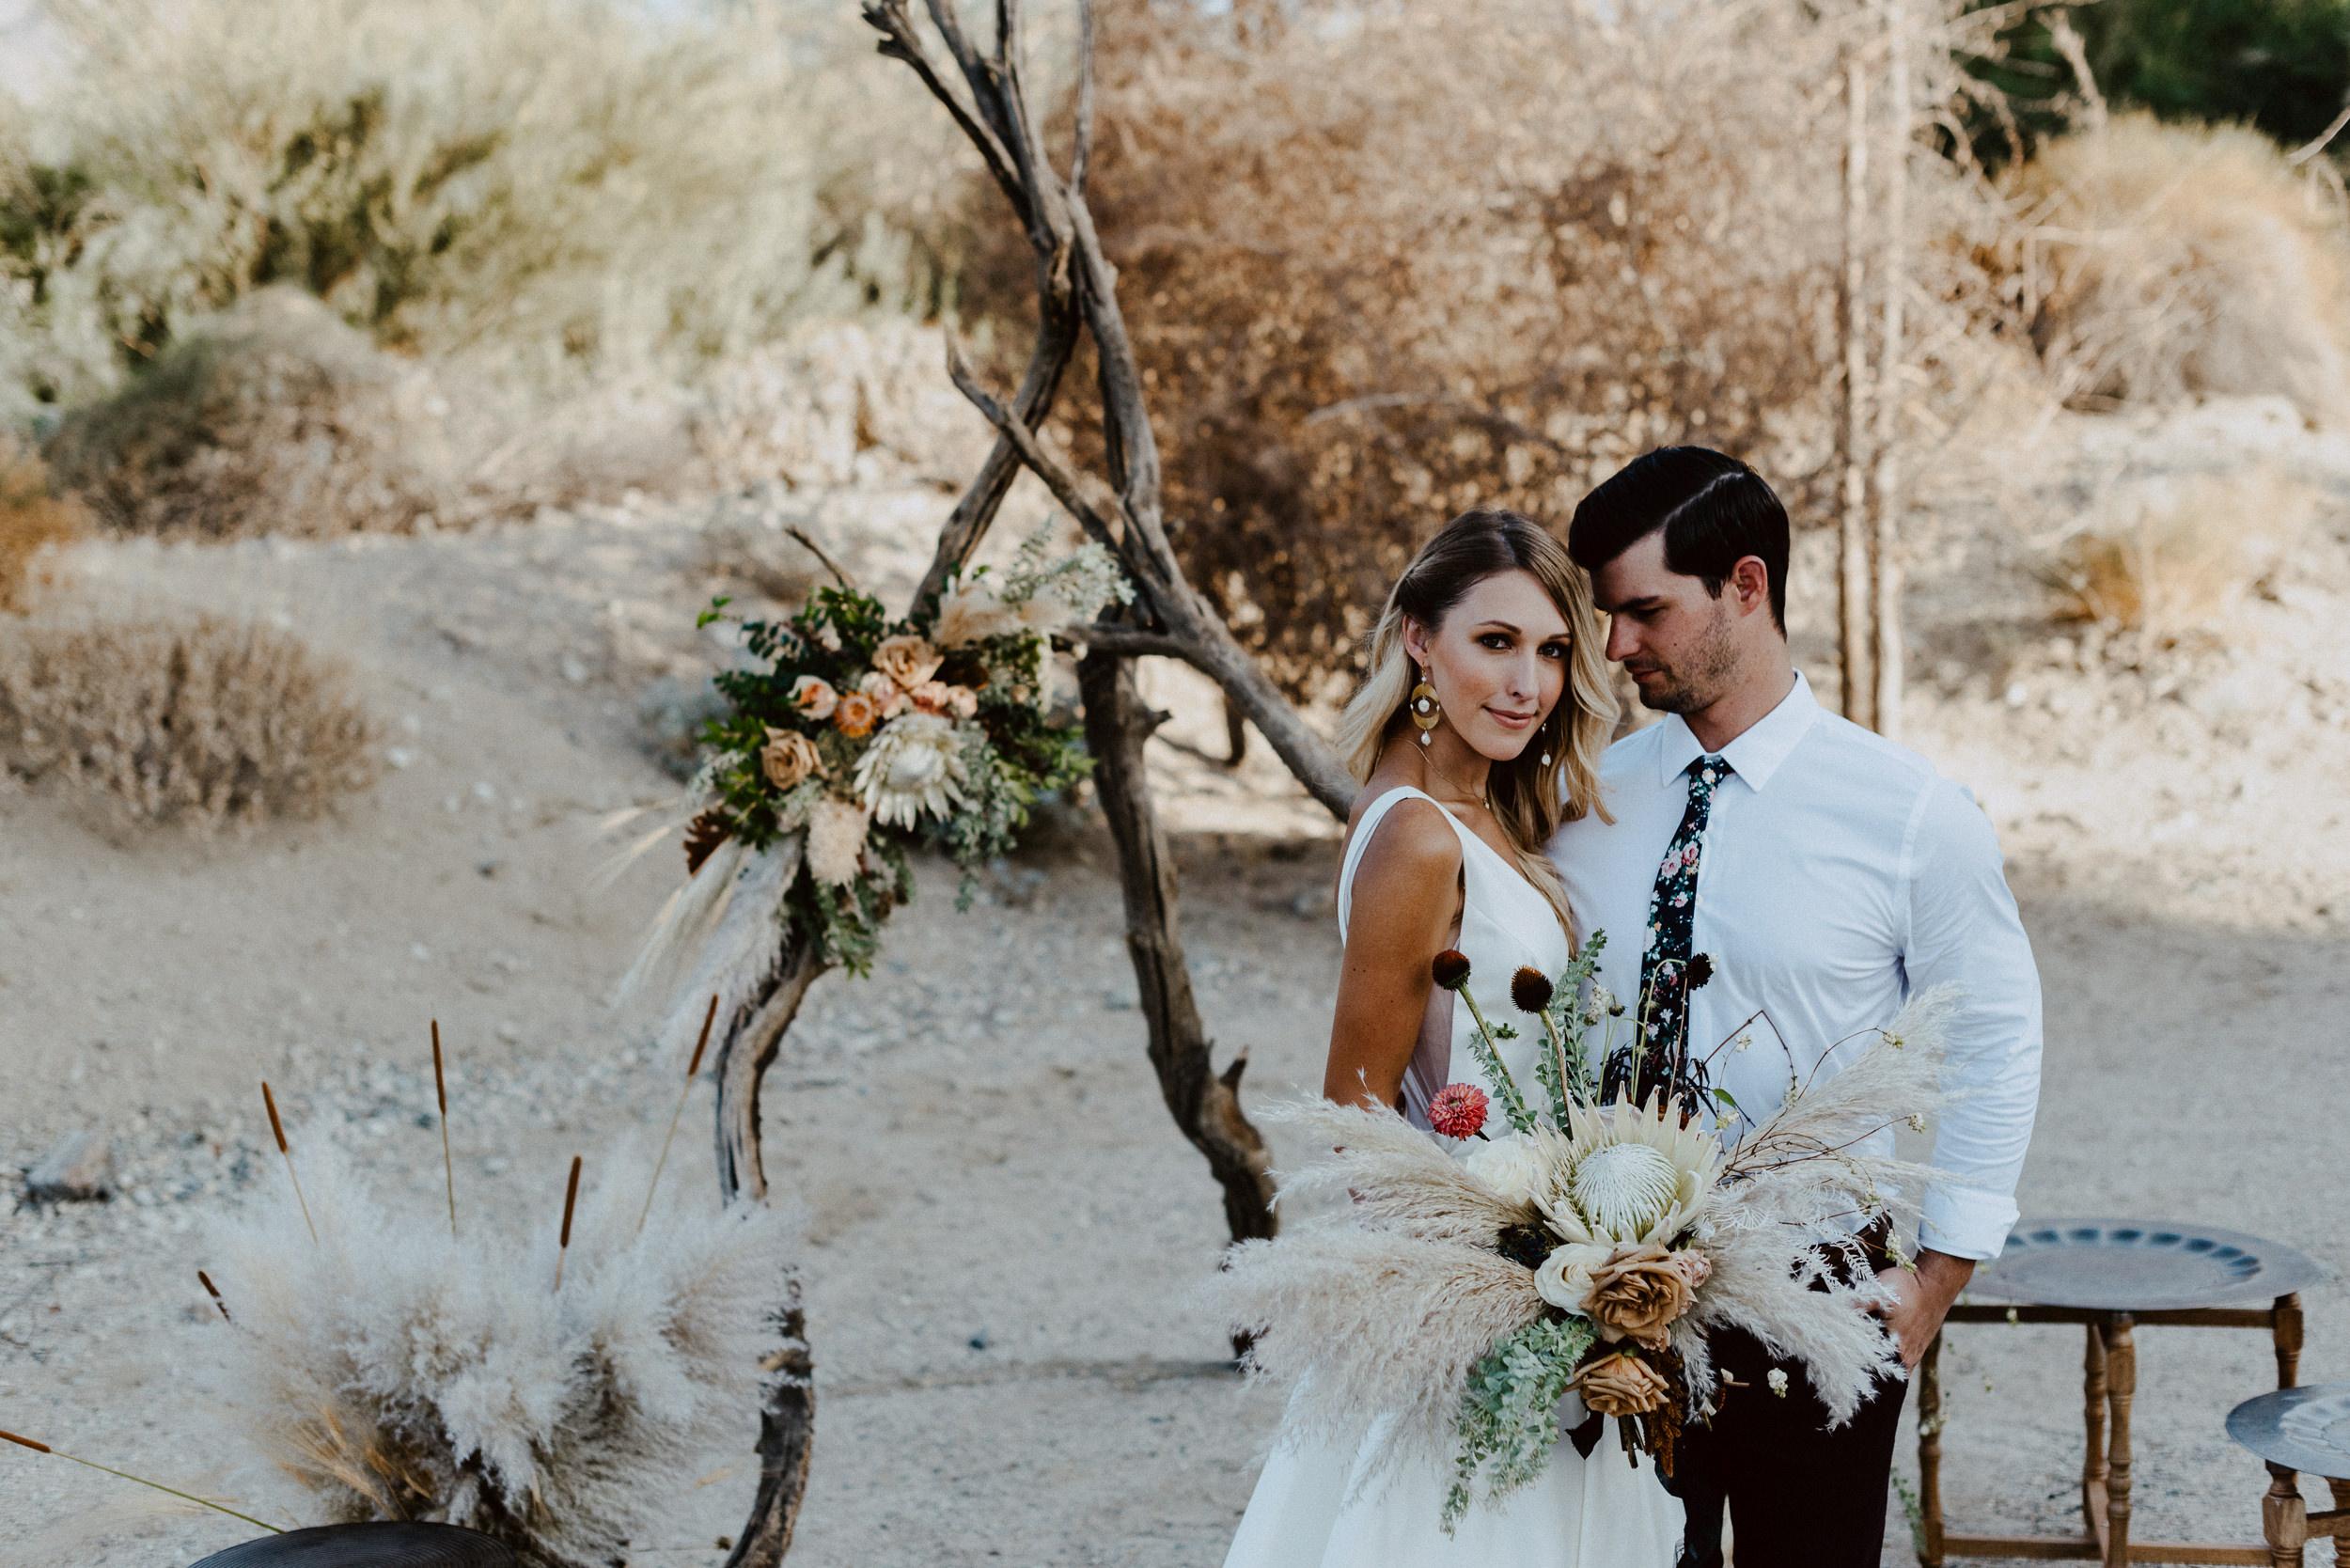 sChelsie + Chris - The Desert Shootout Wedding Romantics at The Living Desert-46.jpg